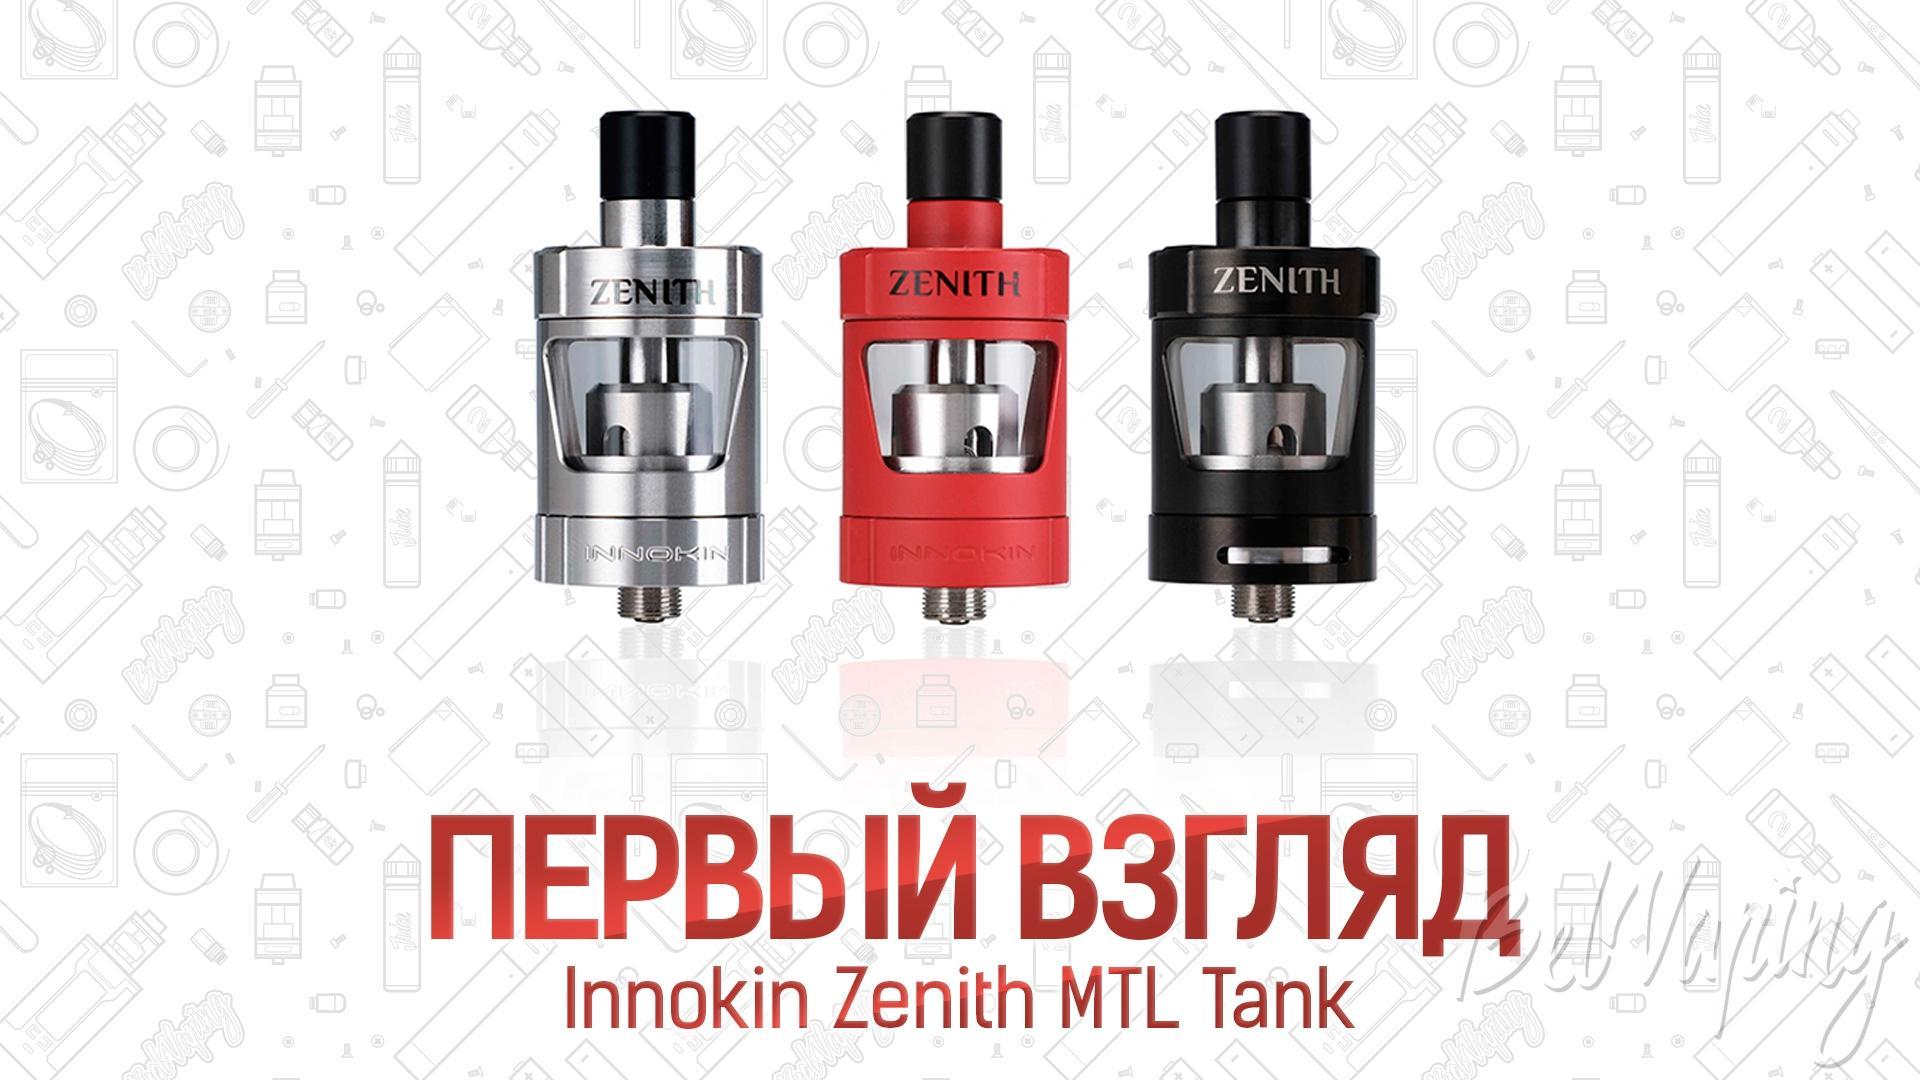 Innokin Zenith MTL Tank. Первый взгляд